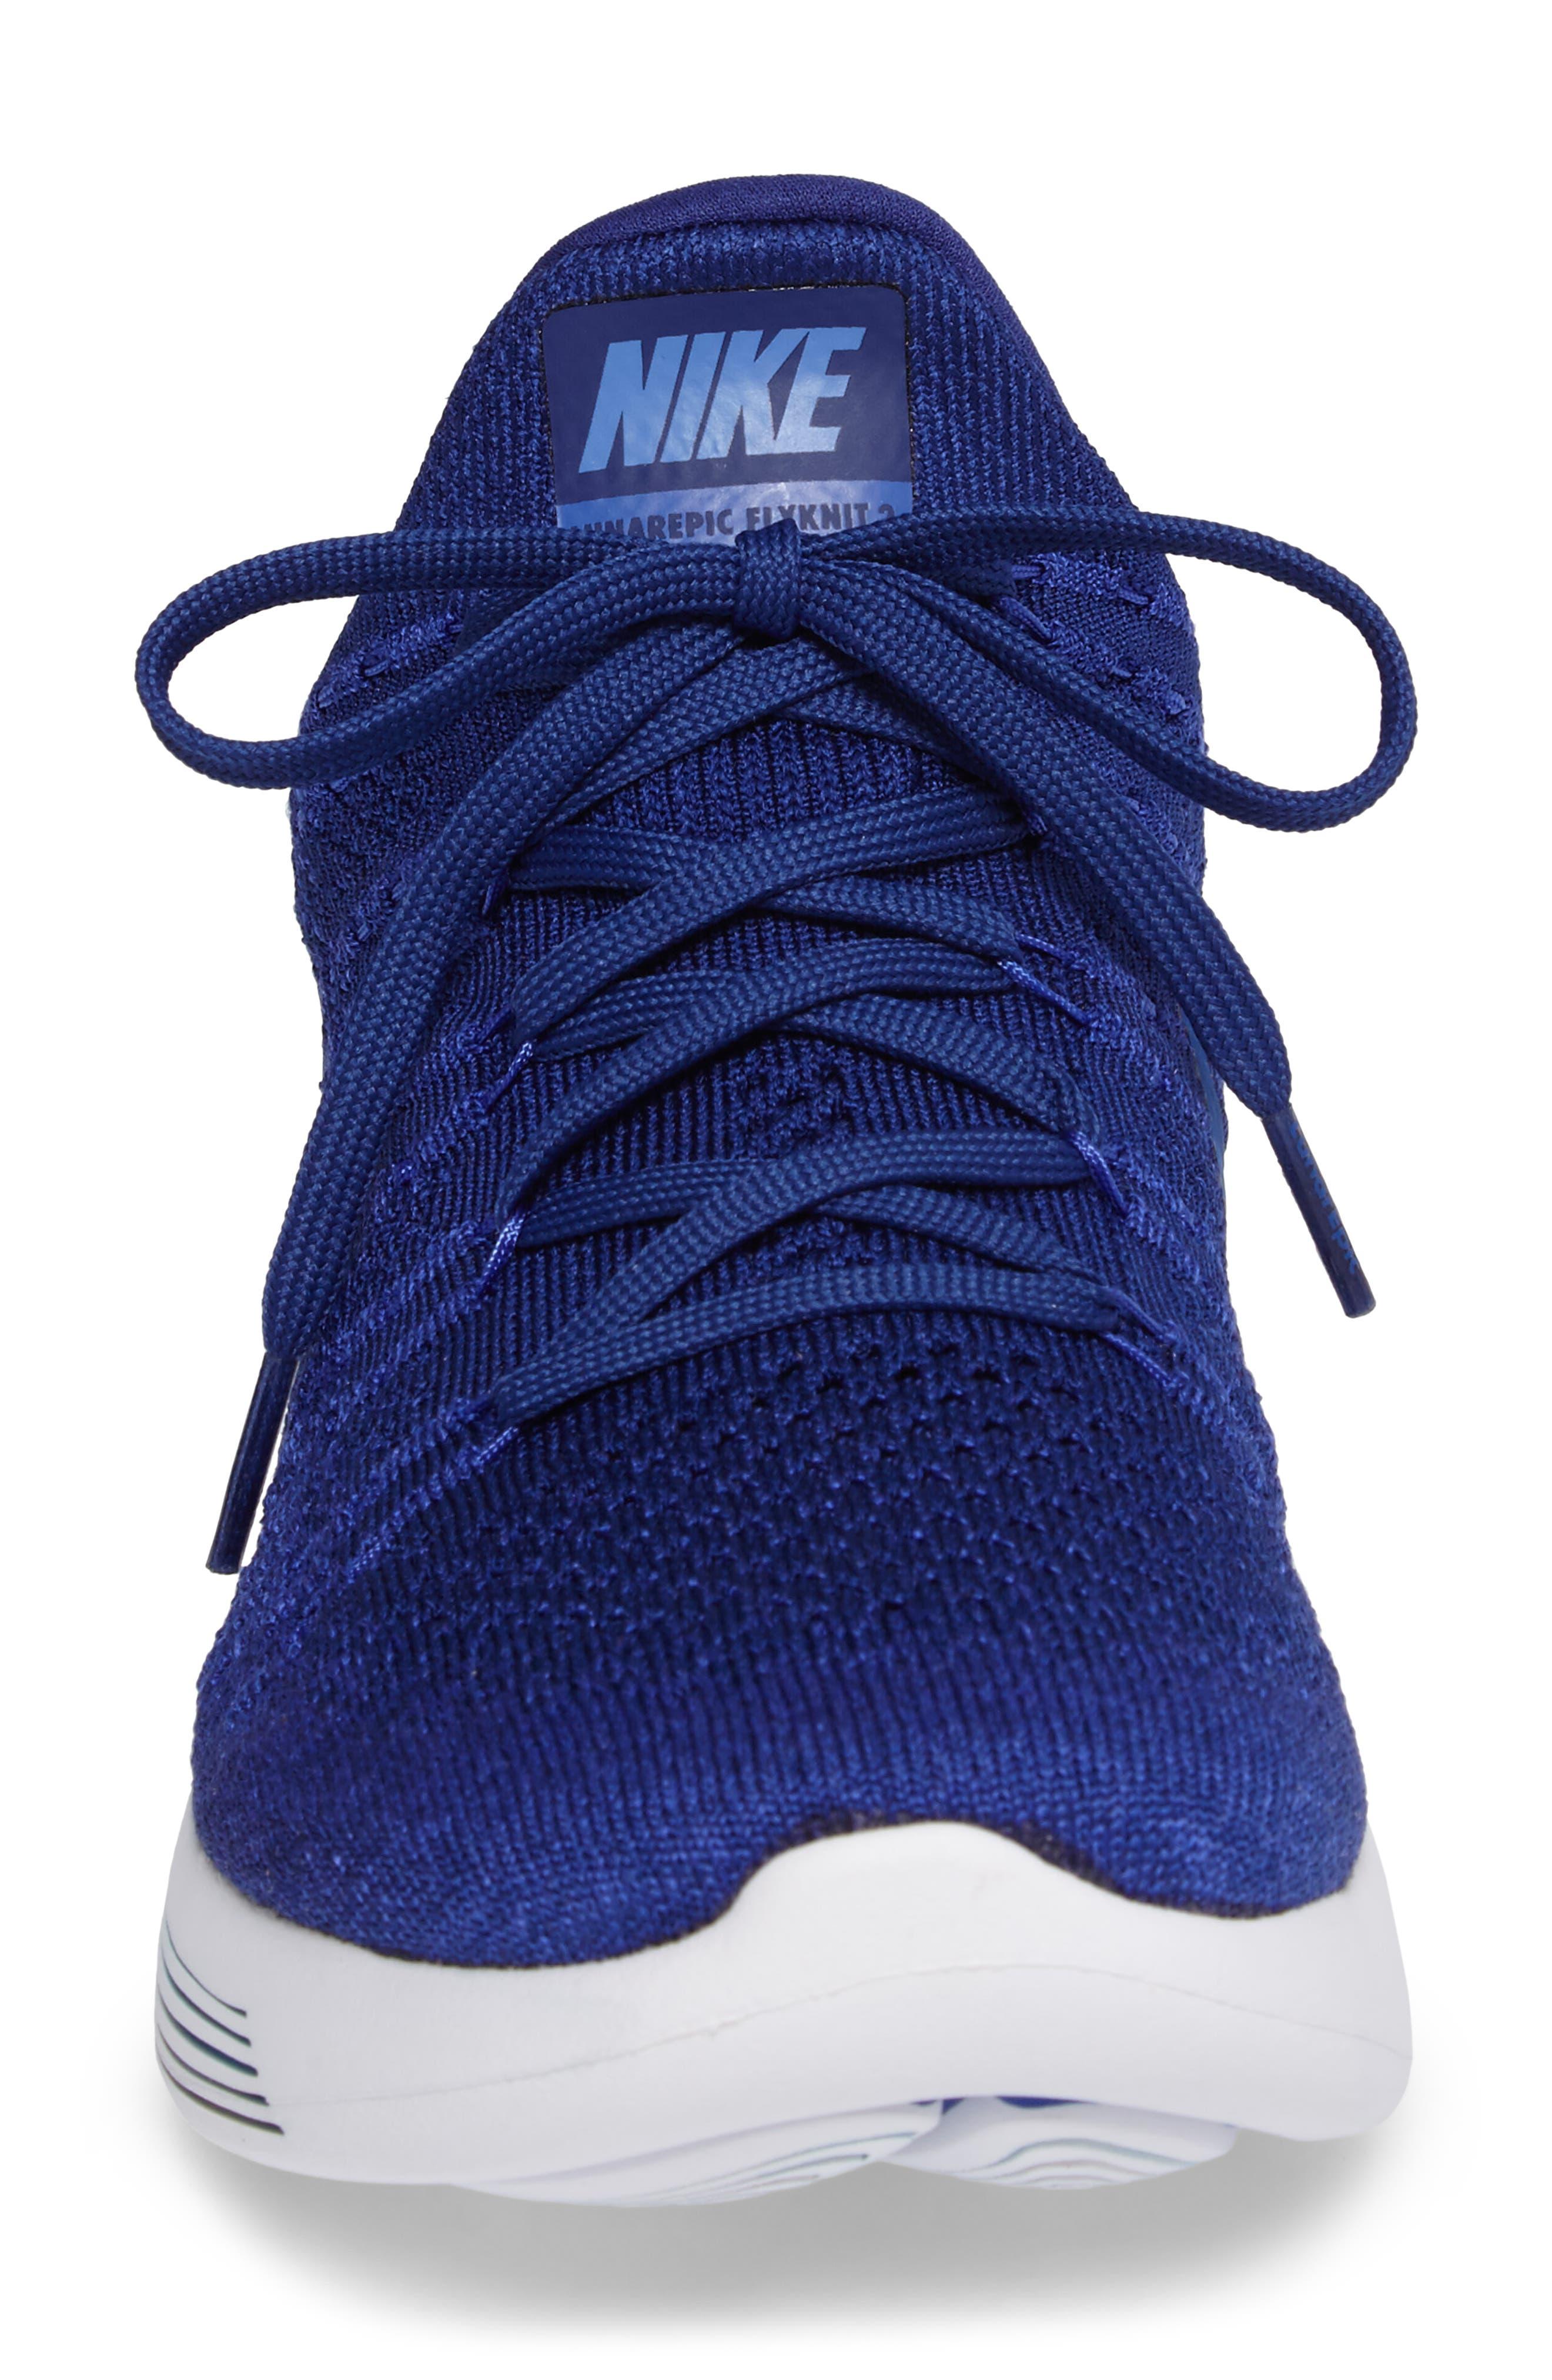 Flyknit 2 LunarEpic Running Shoe,                             Alternate thumbnail 4, color,                             Royal Blue/ Blue